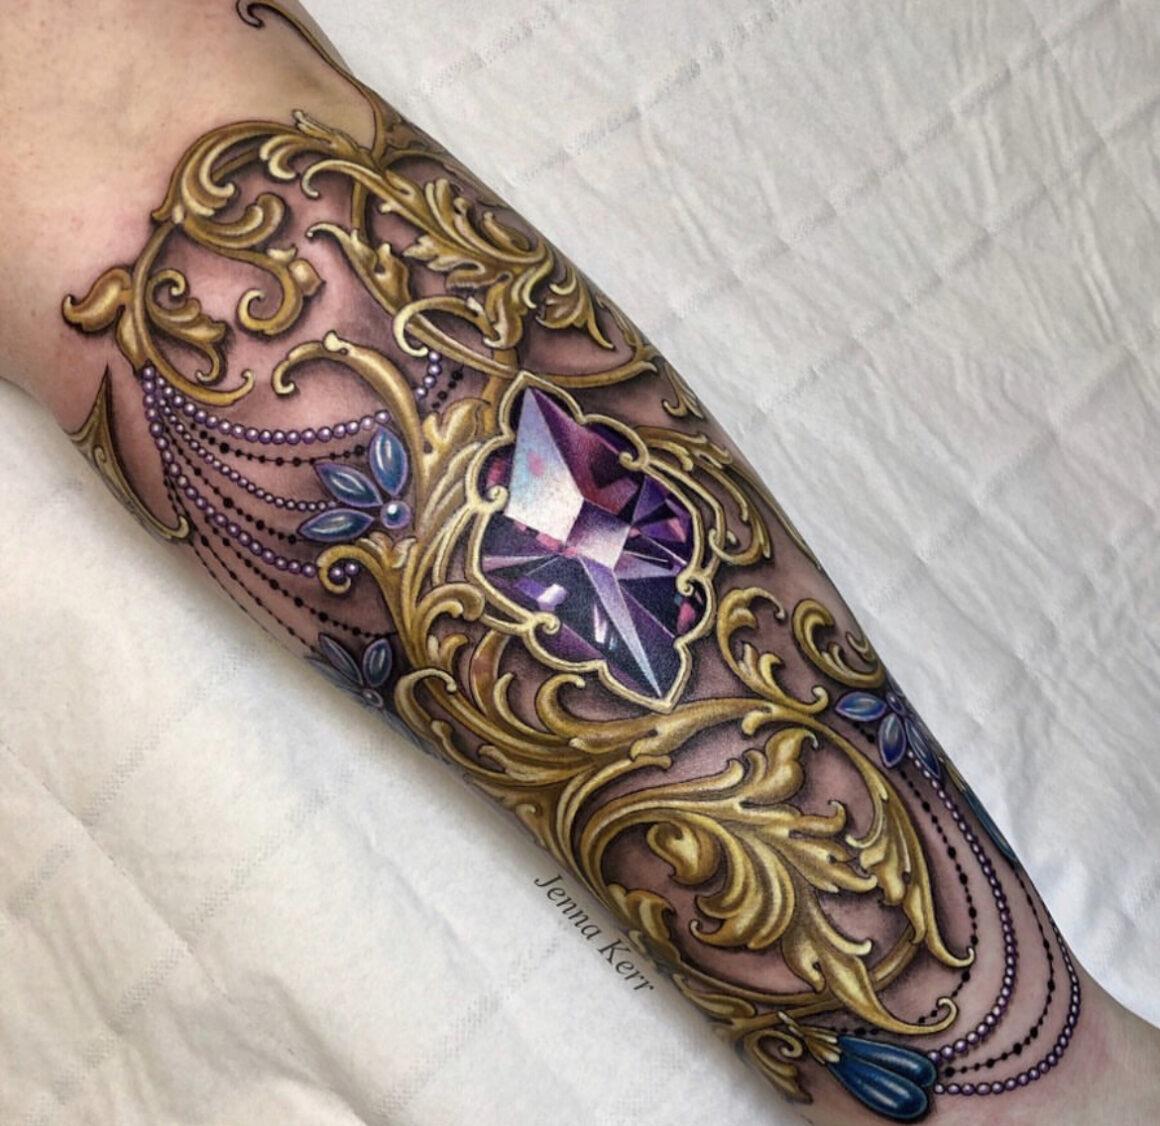 Jenna Kerr, Royal Gothic Tattoo Studio, Bridgend, UK